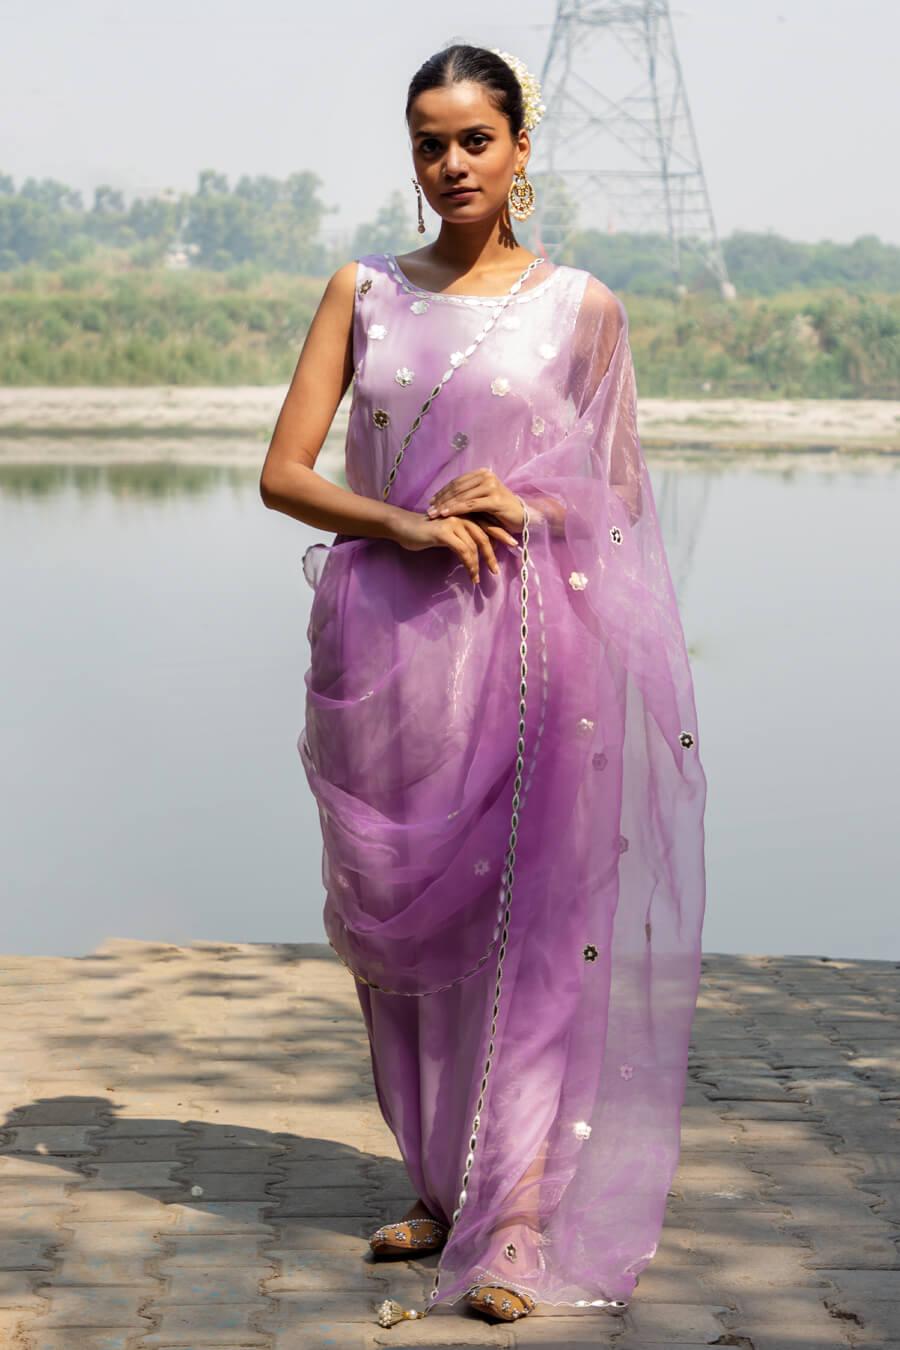 Pastel Lilac Saree Drape Gown